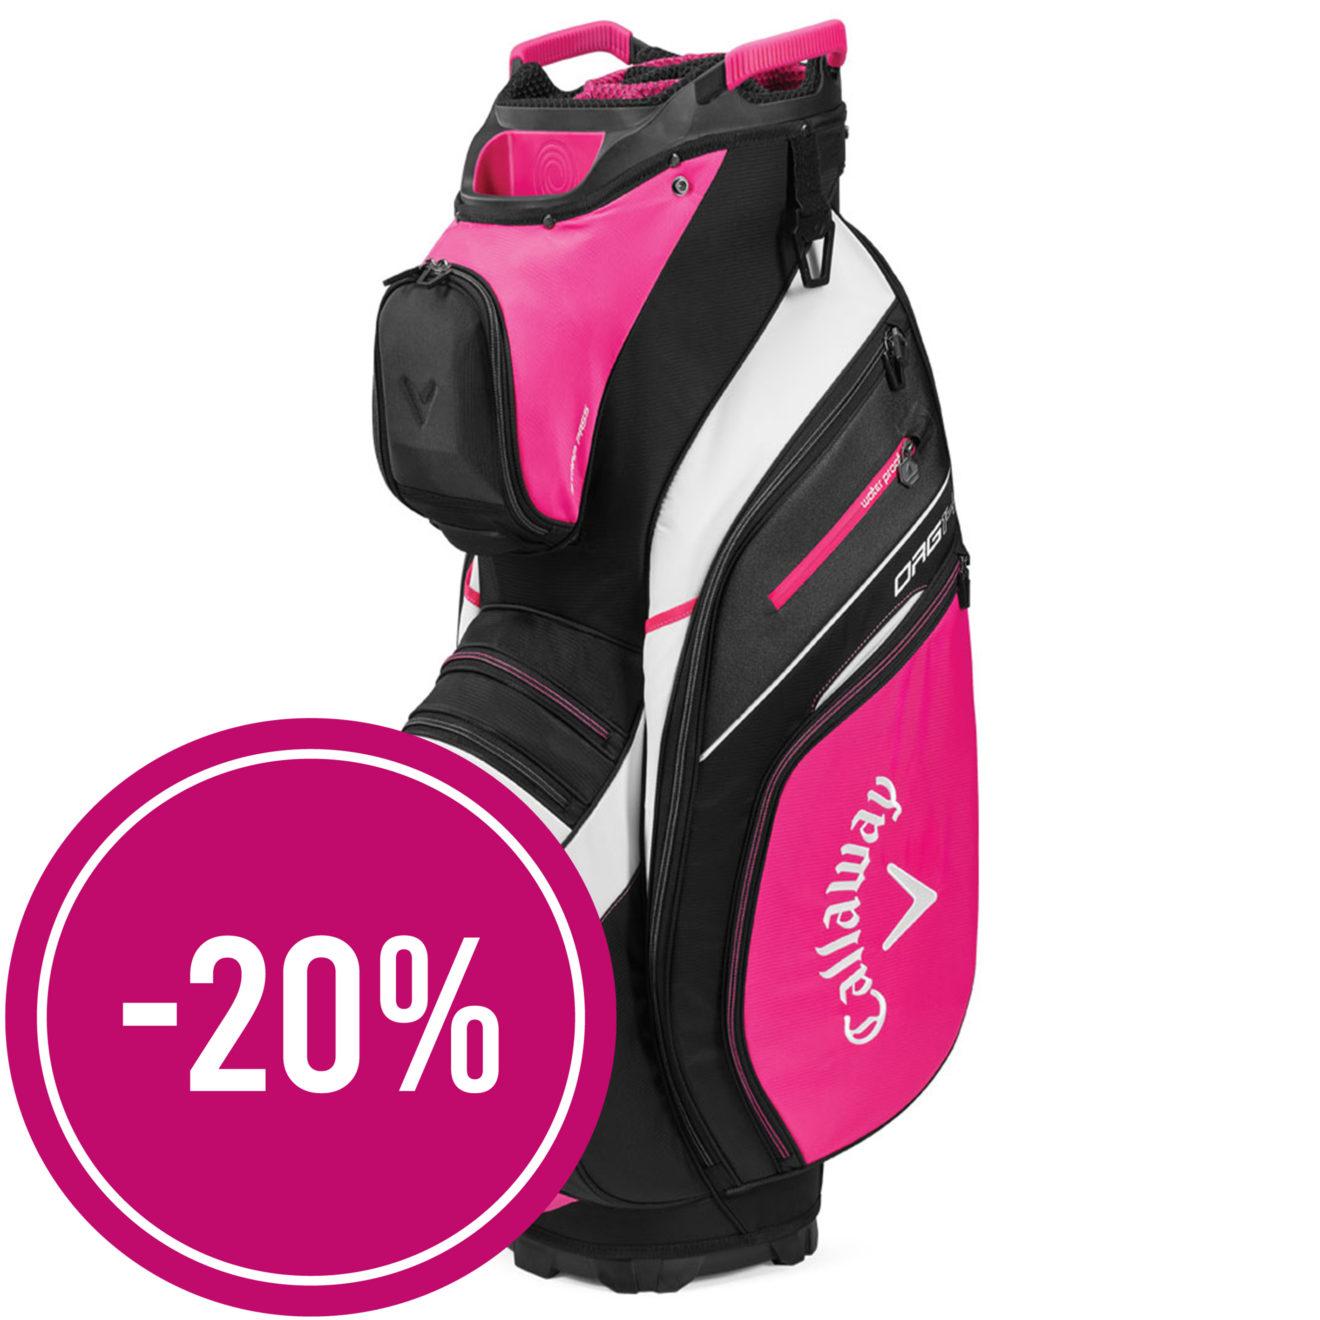 callaway_golf-org_14_cart_pink_black_white-2021-original